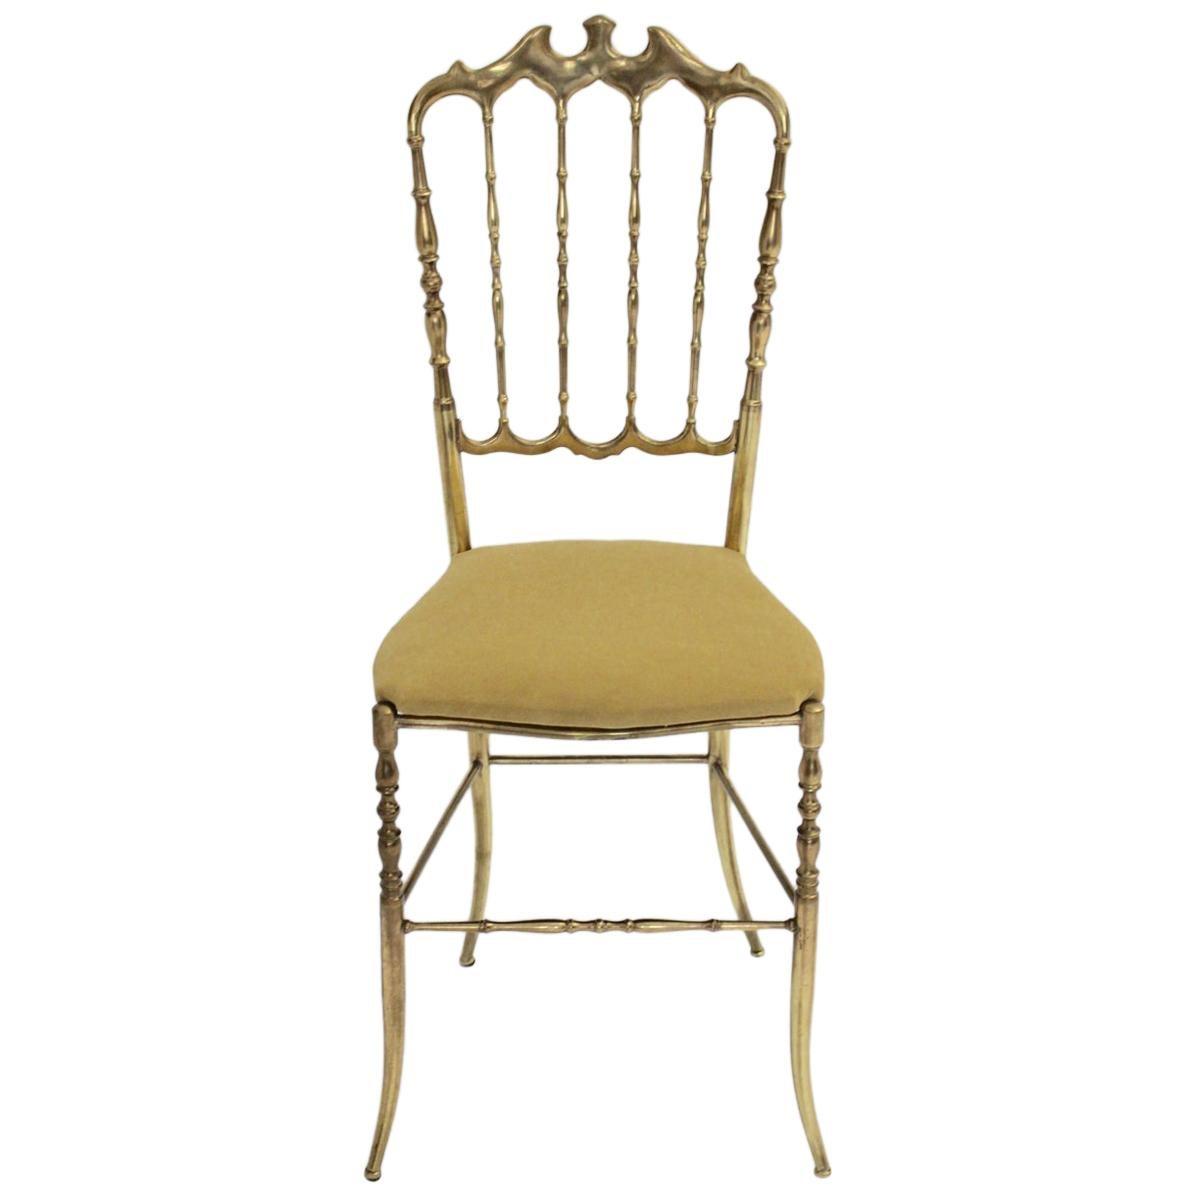 Mid-Century Modern Chiavari Brass Vintage Side Chair, 1960s, Italy